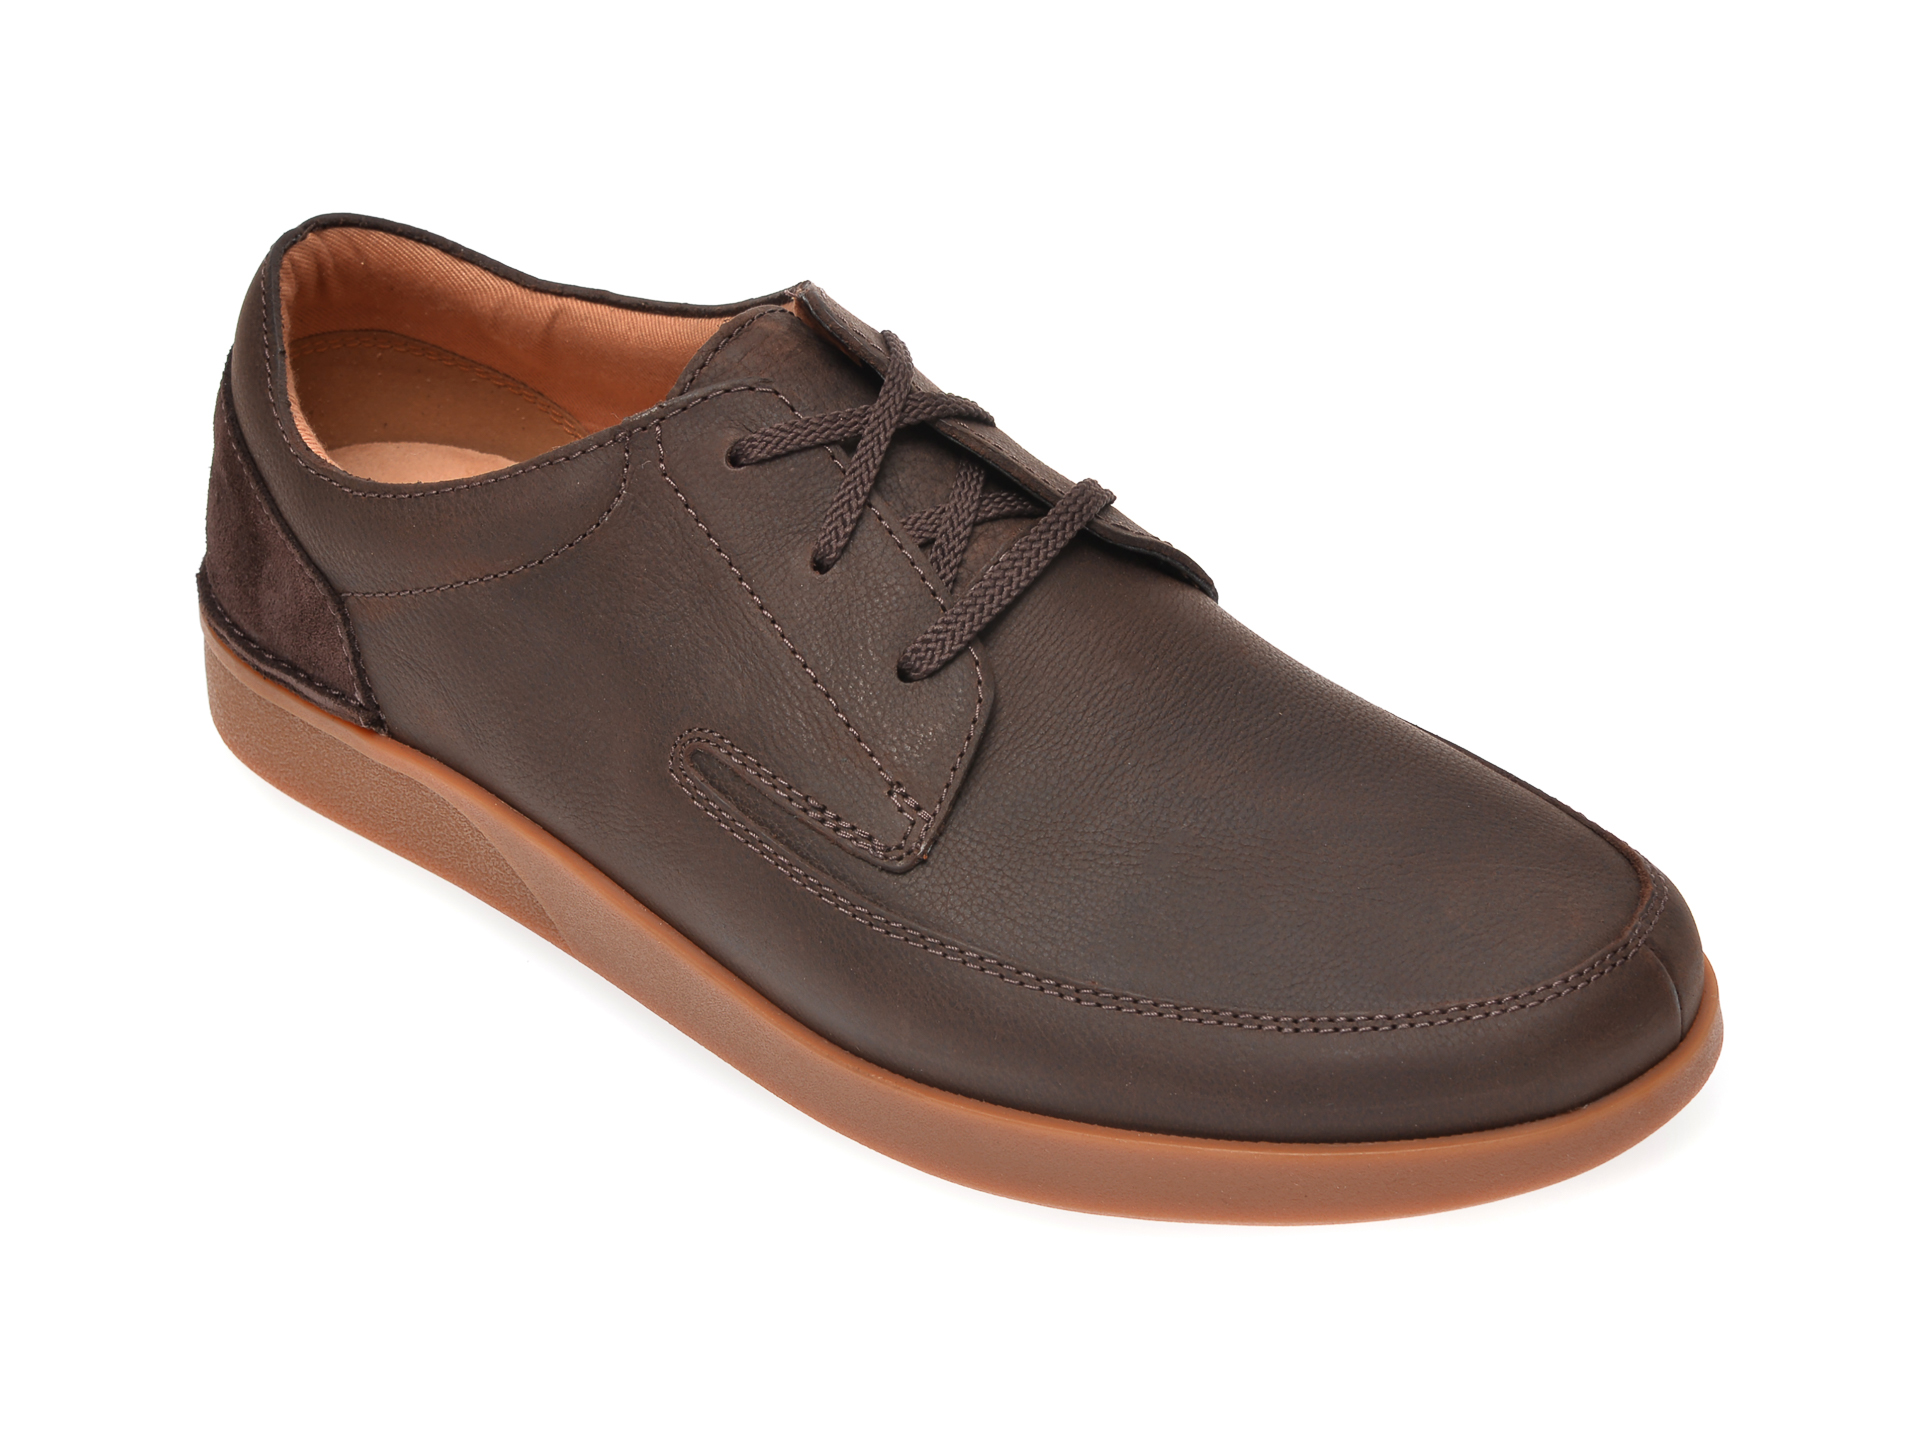 Pantofi CLARKS maro, Oakland Craft, din piele naturala imagine